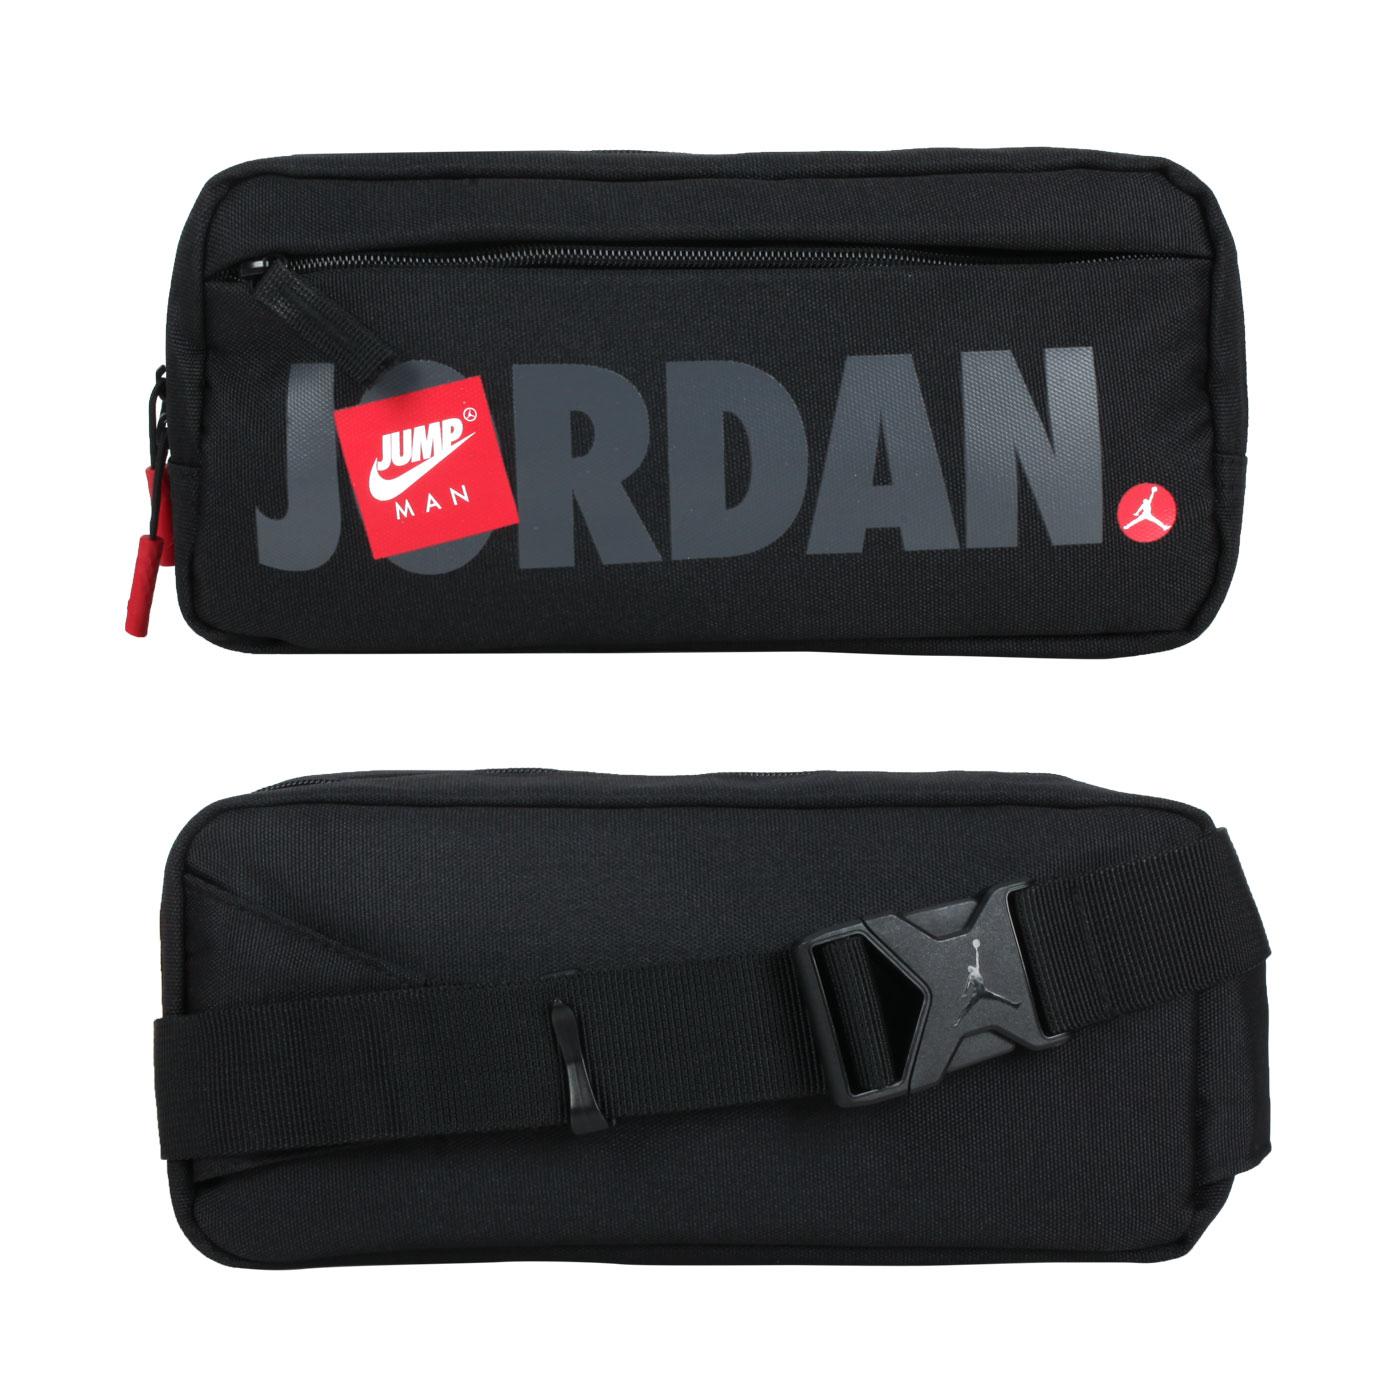 NIKE JORDAN 中型腰包 JD2113015AD-001 - 黑灰紅